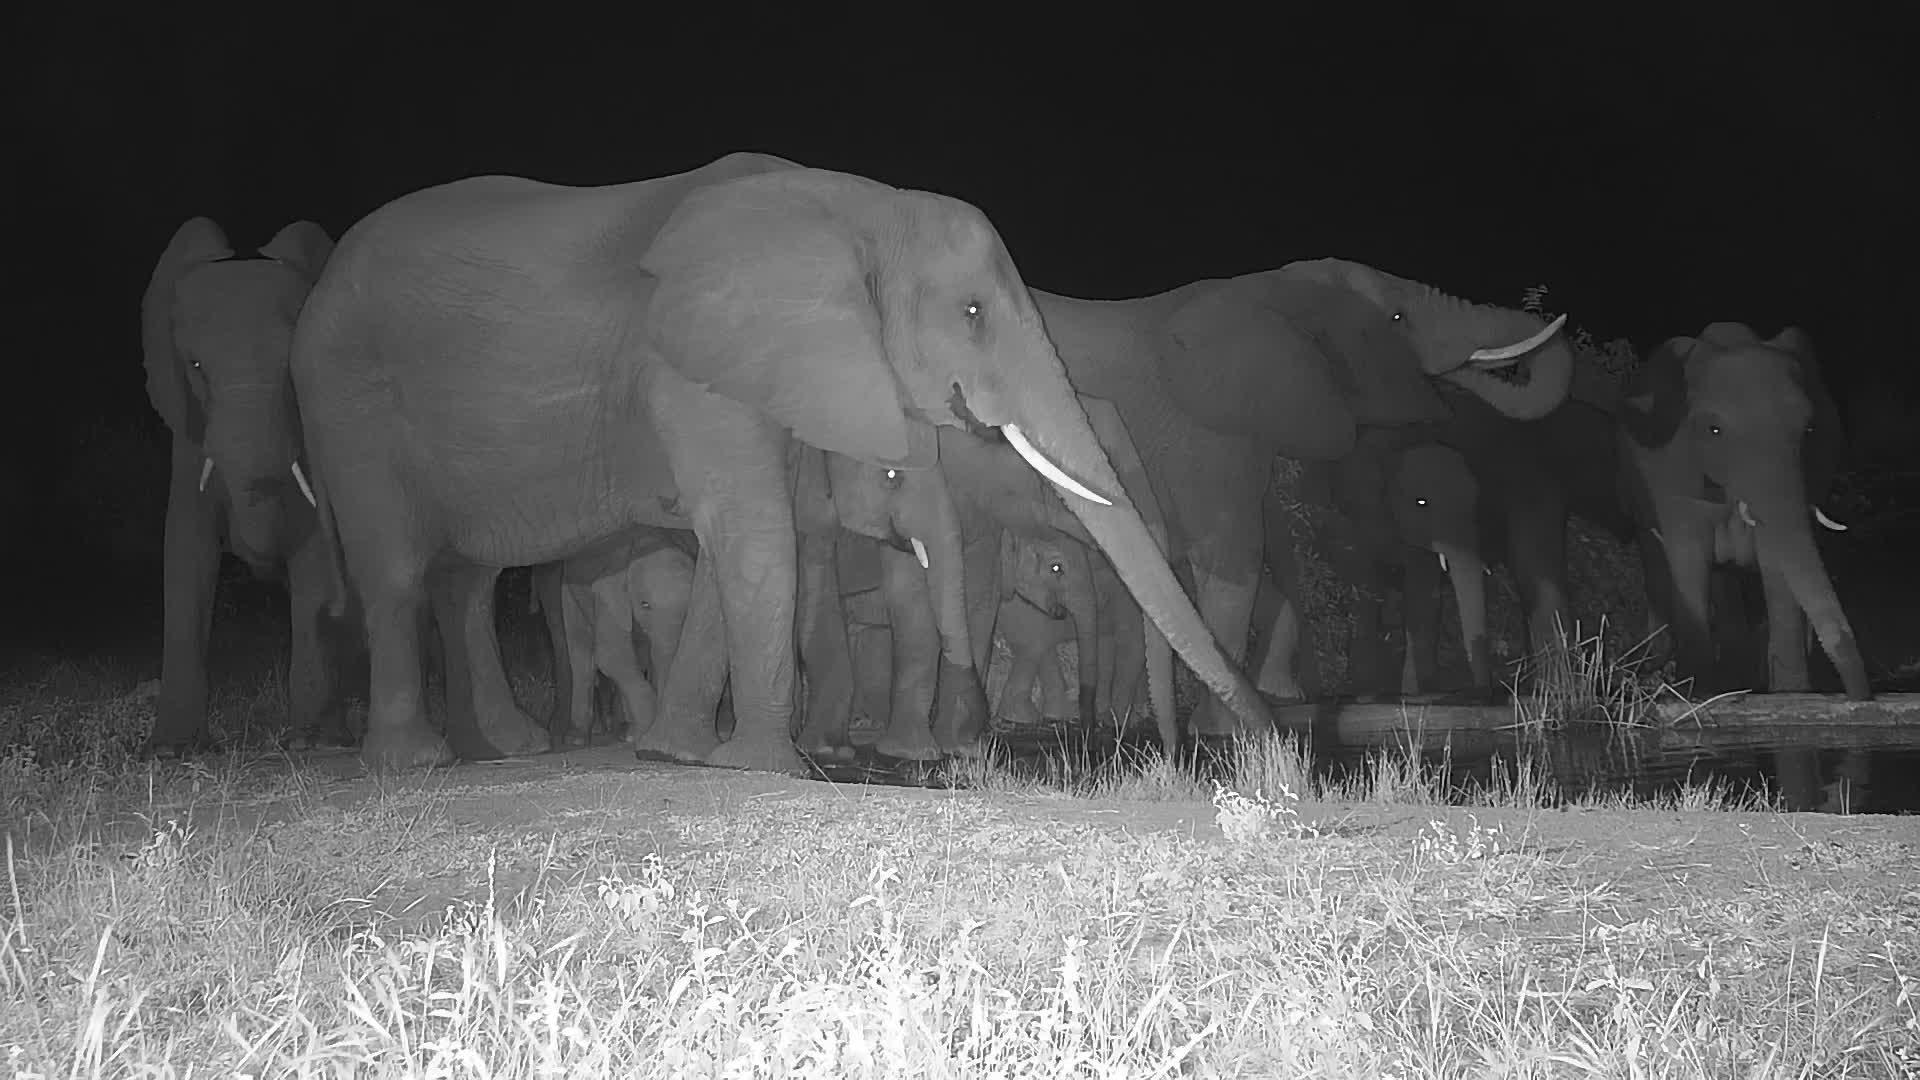 VIDEO: Elephant breeding herd at the waterhole